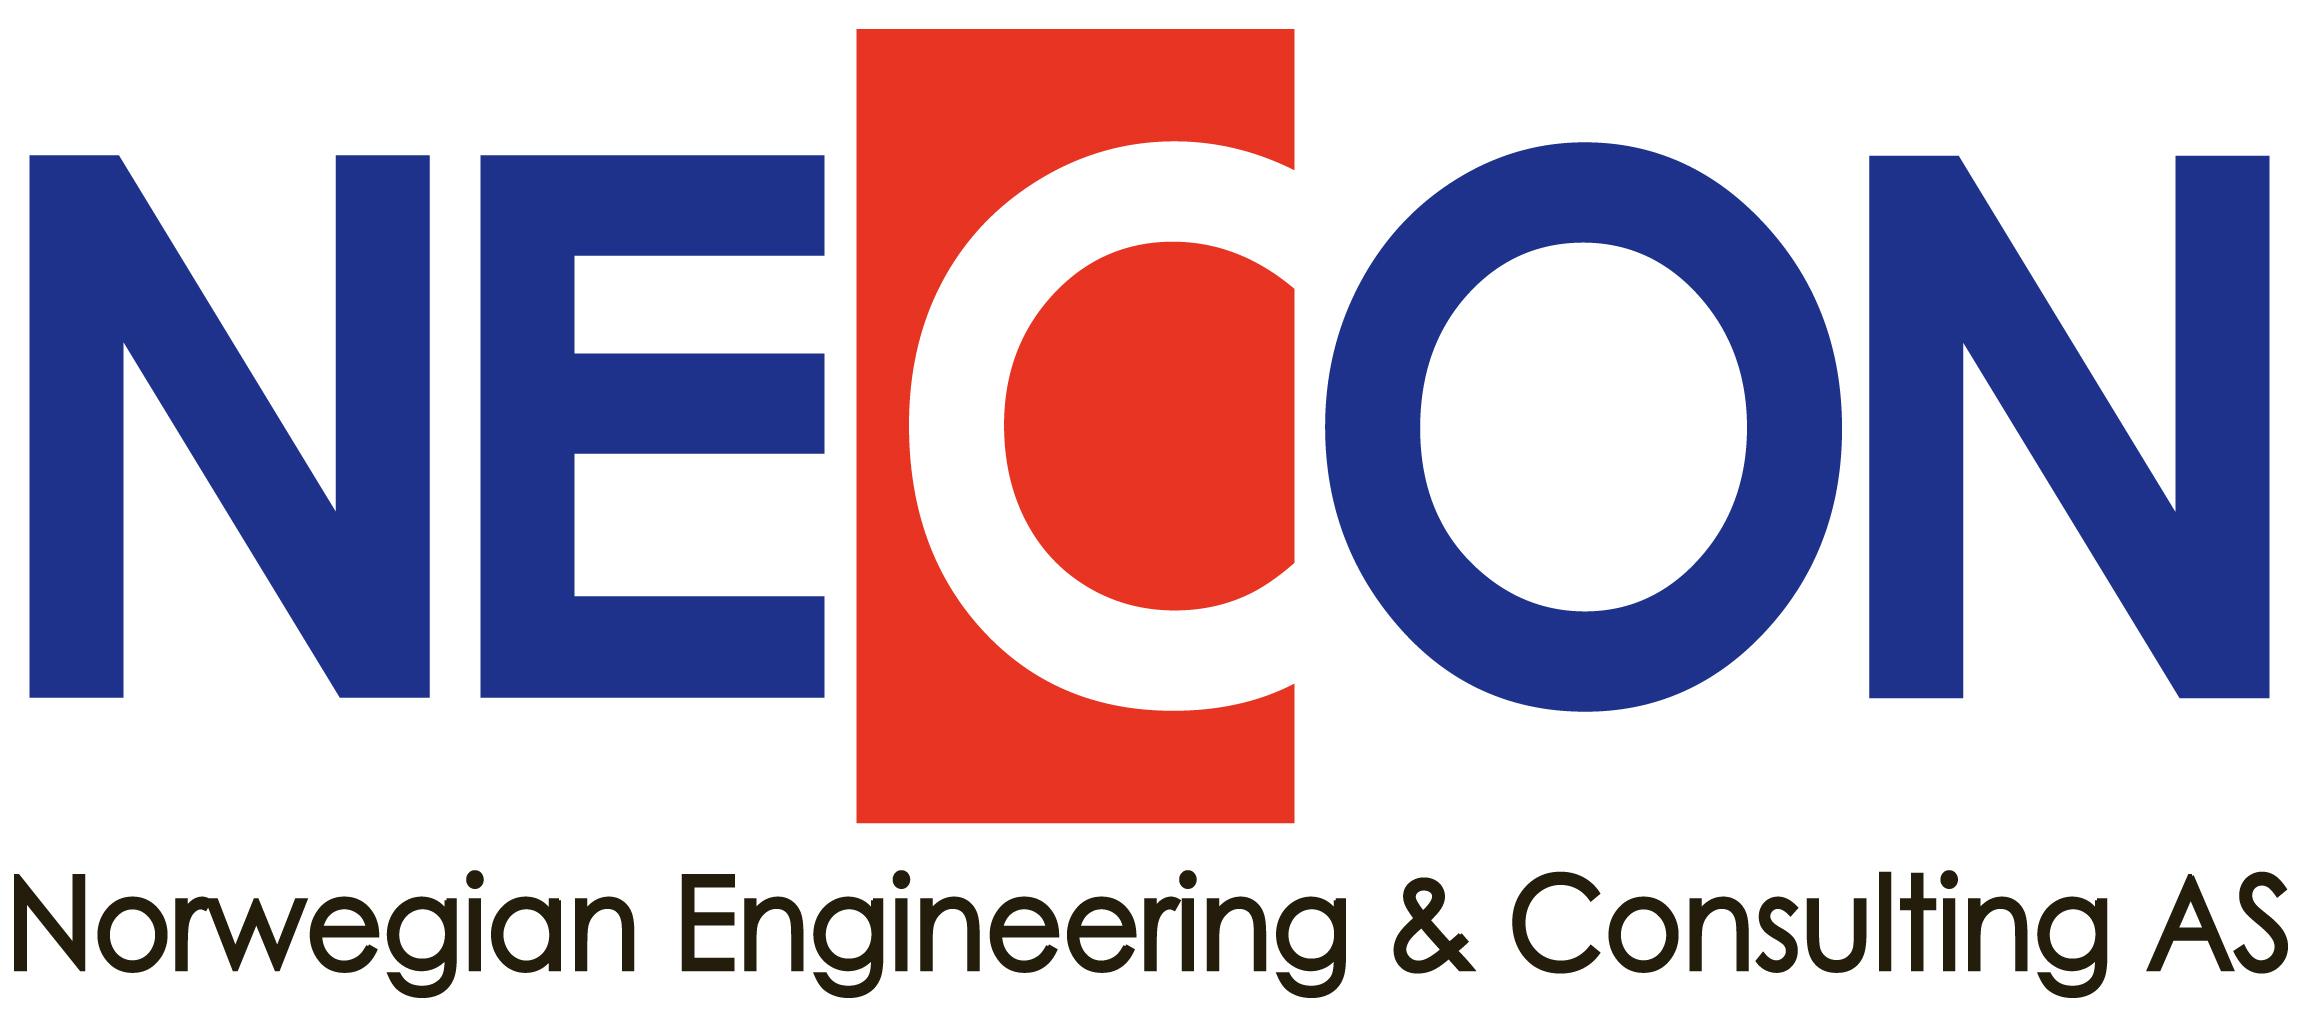 NECON_logo.jpg